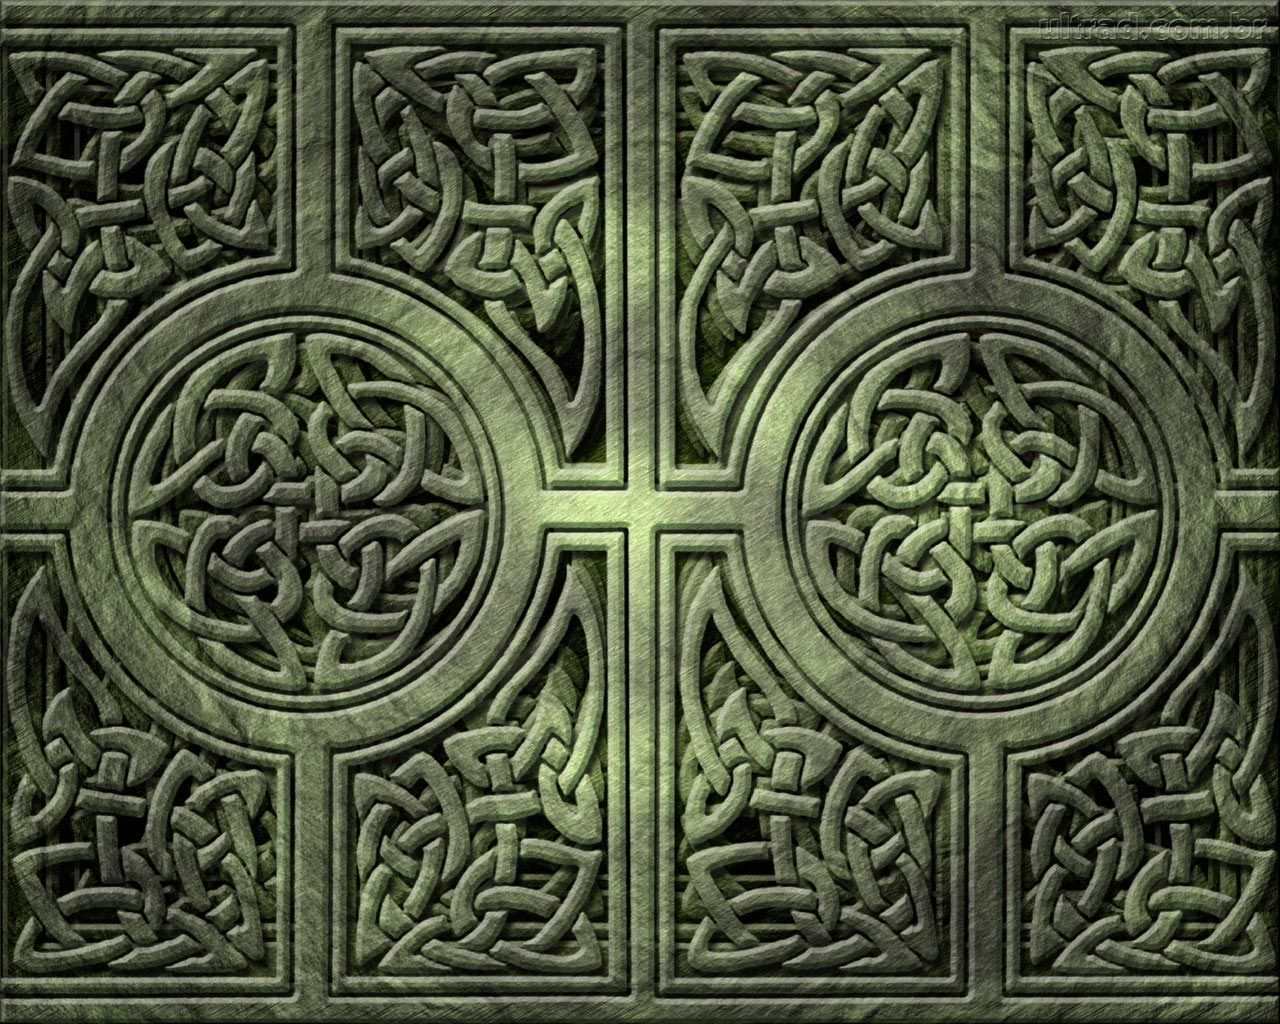 http://1.bp.blogspot.com/-N23GpinXm_I/UDmTFj3b9OI/AAAAAAAABe4/P_Jx4m34Orw/s1600/235818_Papel-de-Parede-Simbolo-celta_1280x1024.jpeg